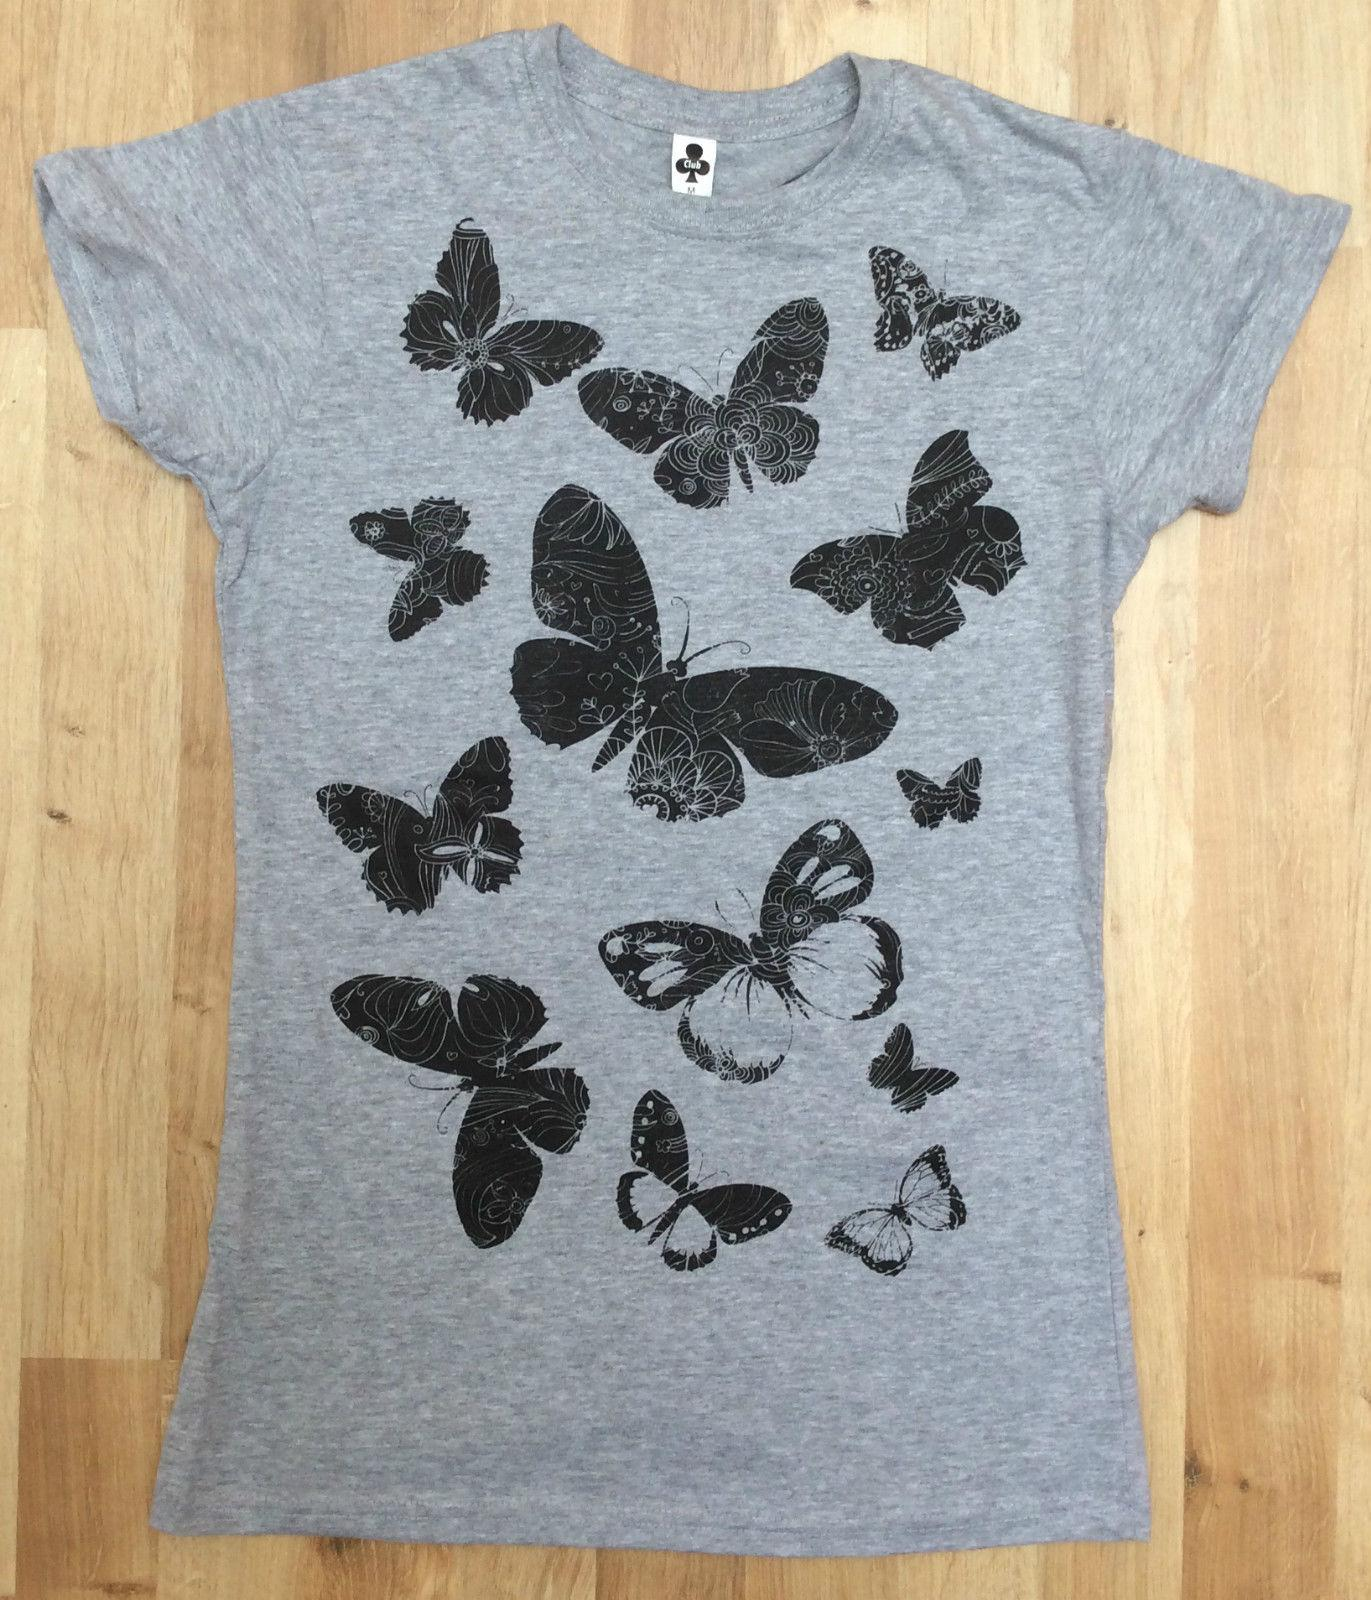 e73fe7e63f43e4 2019 New Womens Black Butterfly Floral Print T Shirt Womens Short Sleeve  Cotton Grey Lady Custom Printed Short Sleeve Tees From Shitan10, $11.75 |  DHgate.